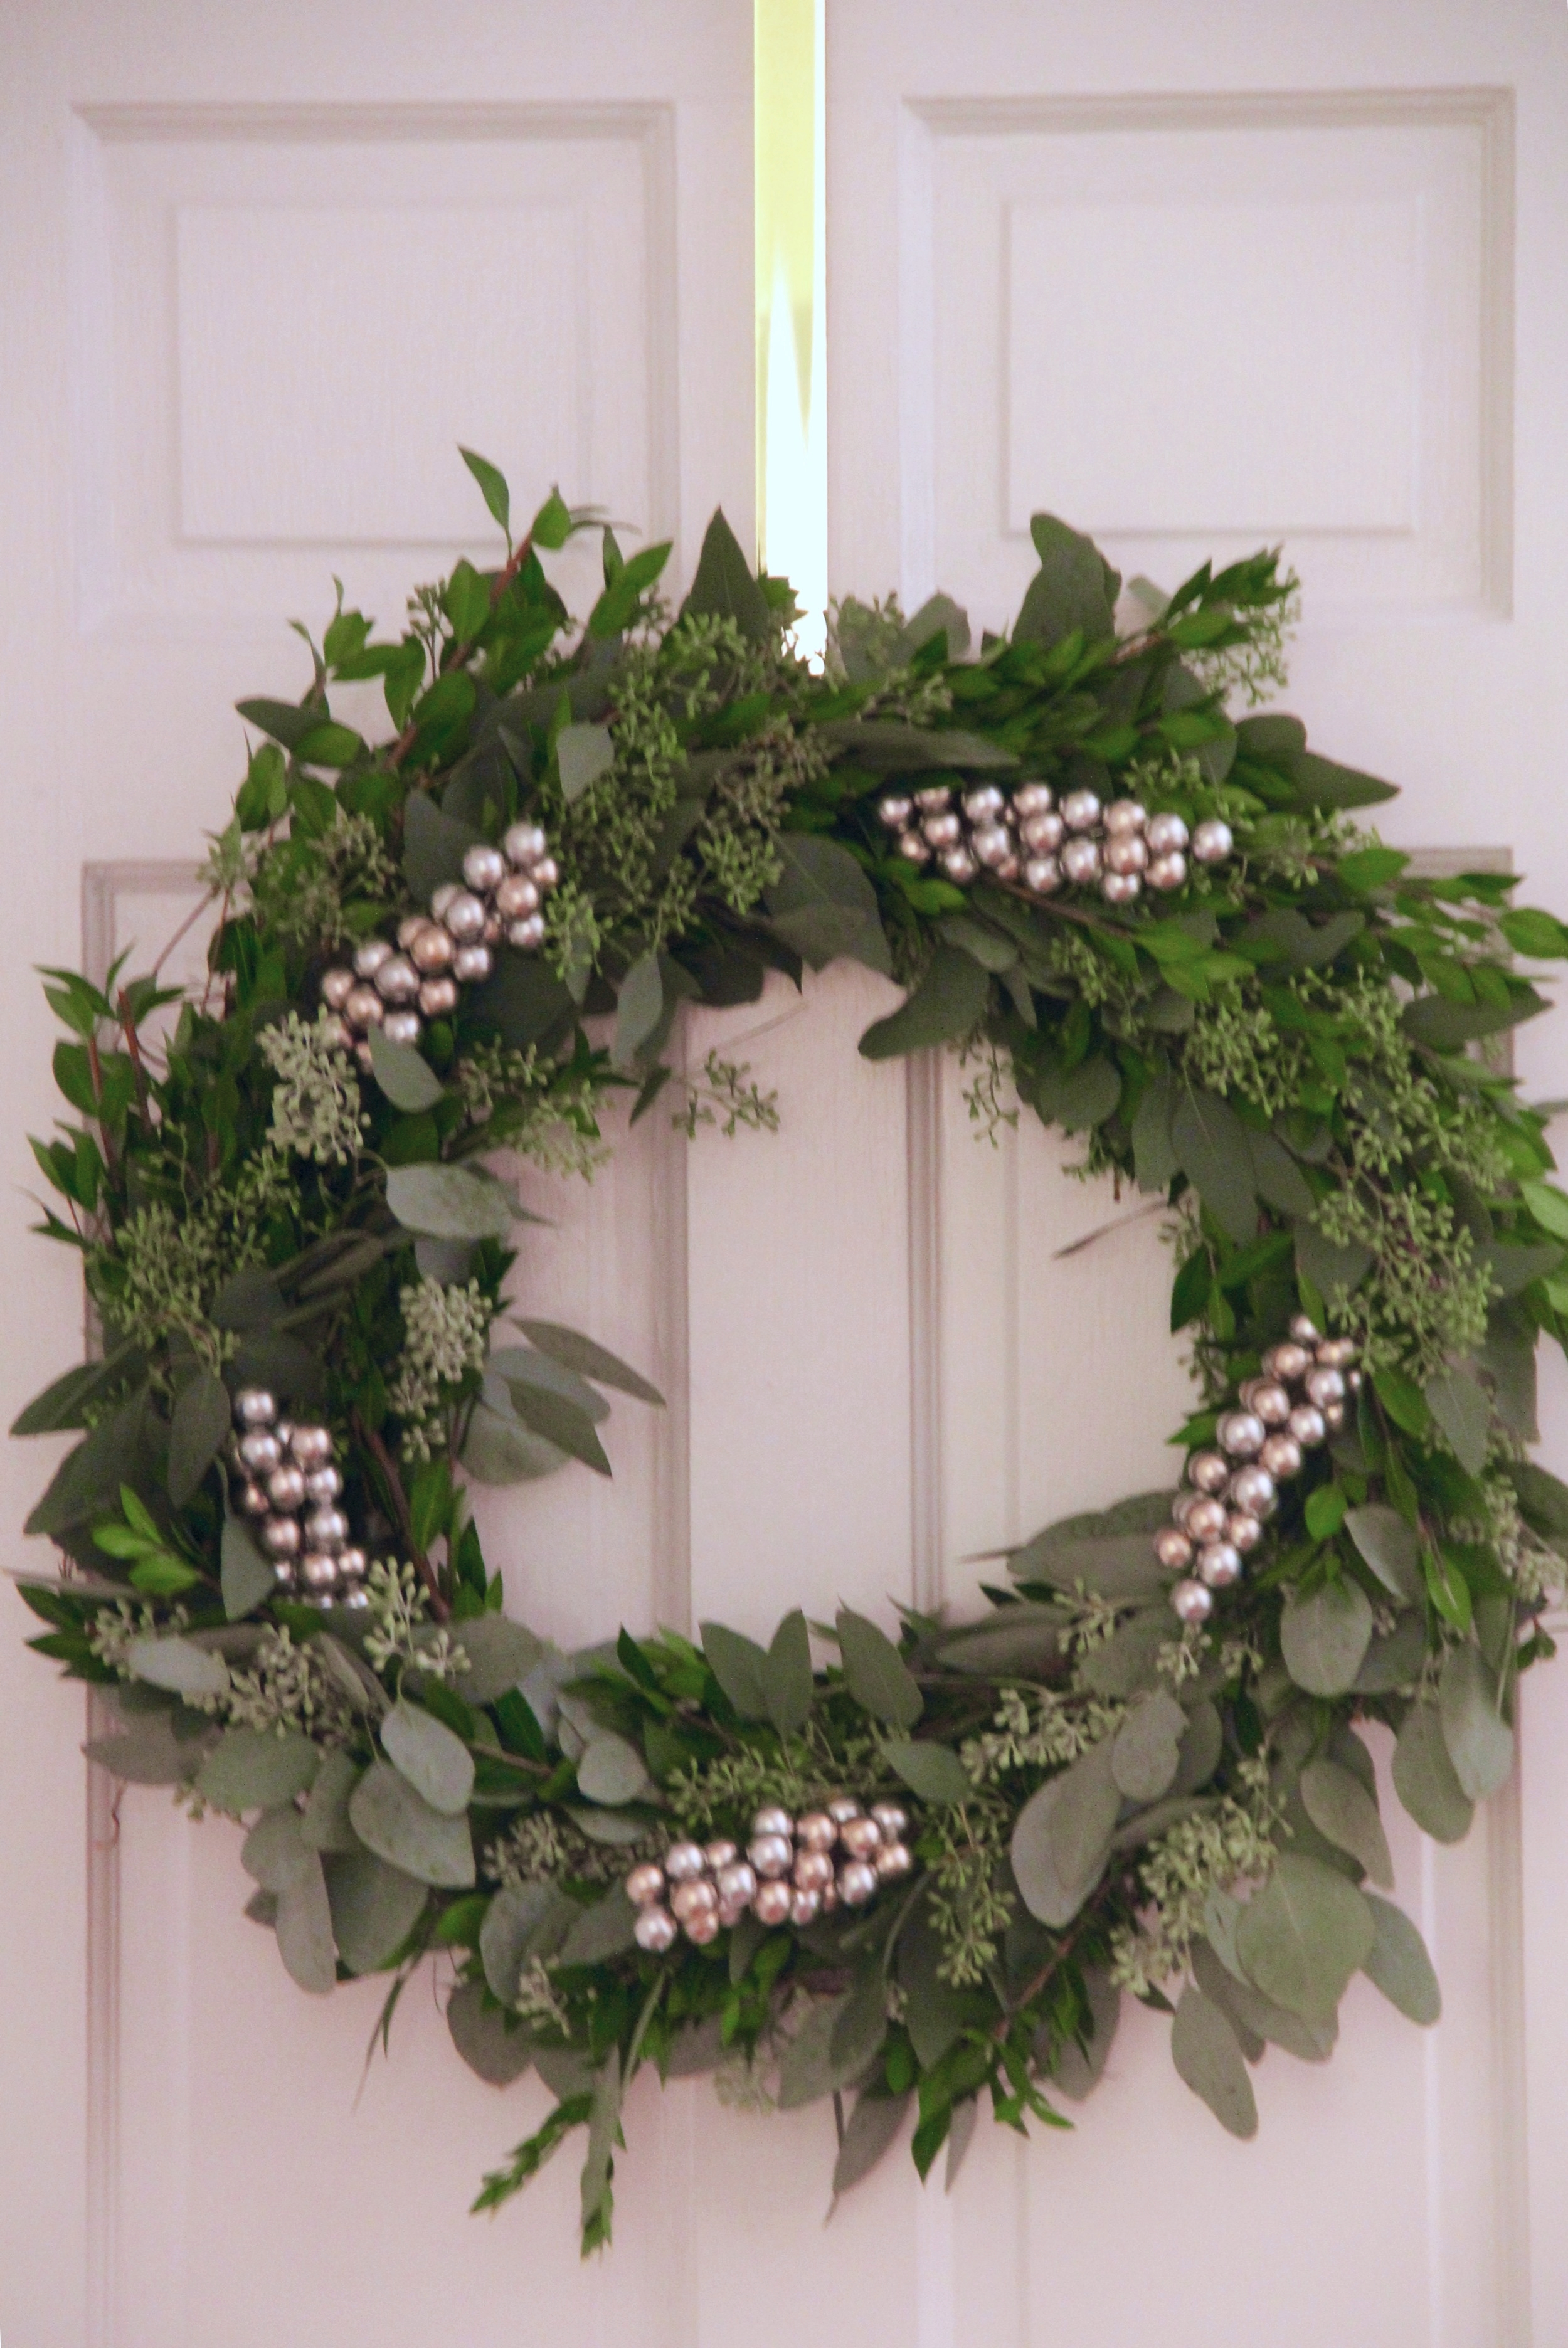 Embellished Wreath.jpg